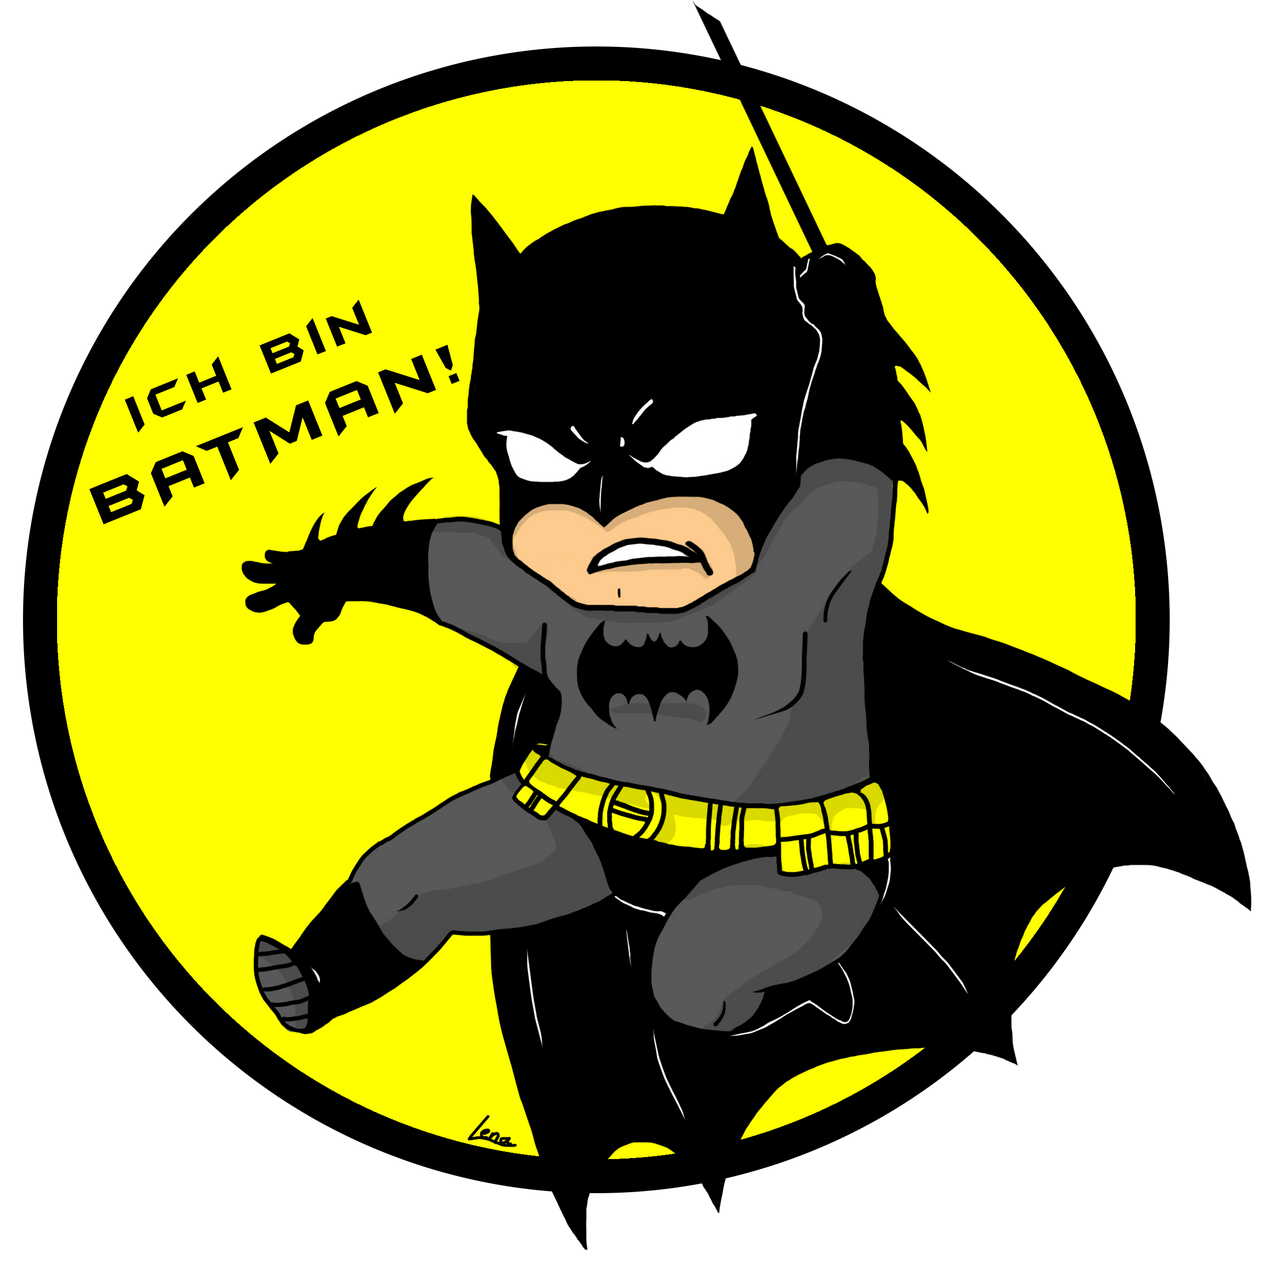 ich bin batman i 39 m batman chibistyle by lenschn on deviantart. Black Bedroom Furniture Sets. Home Design Ideas